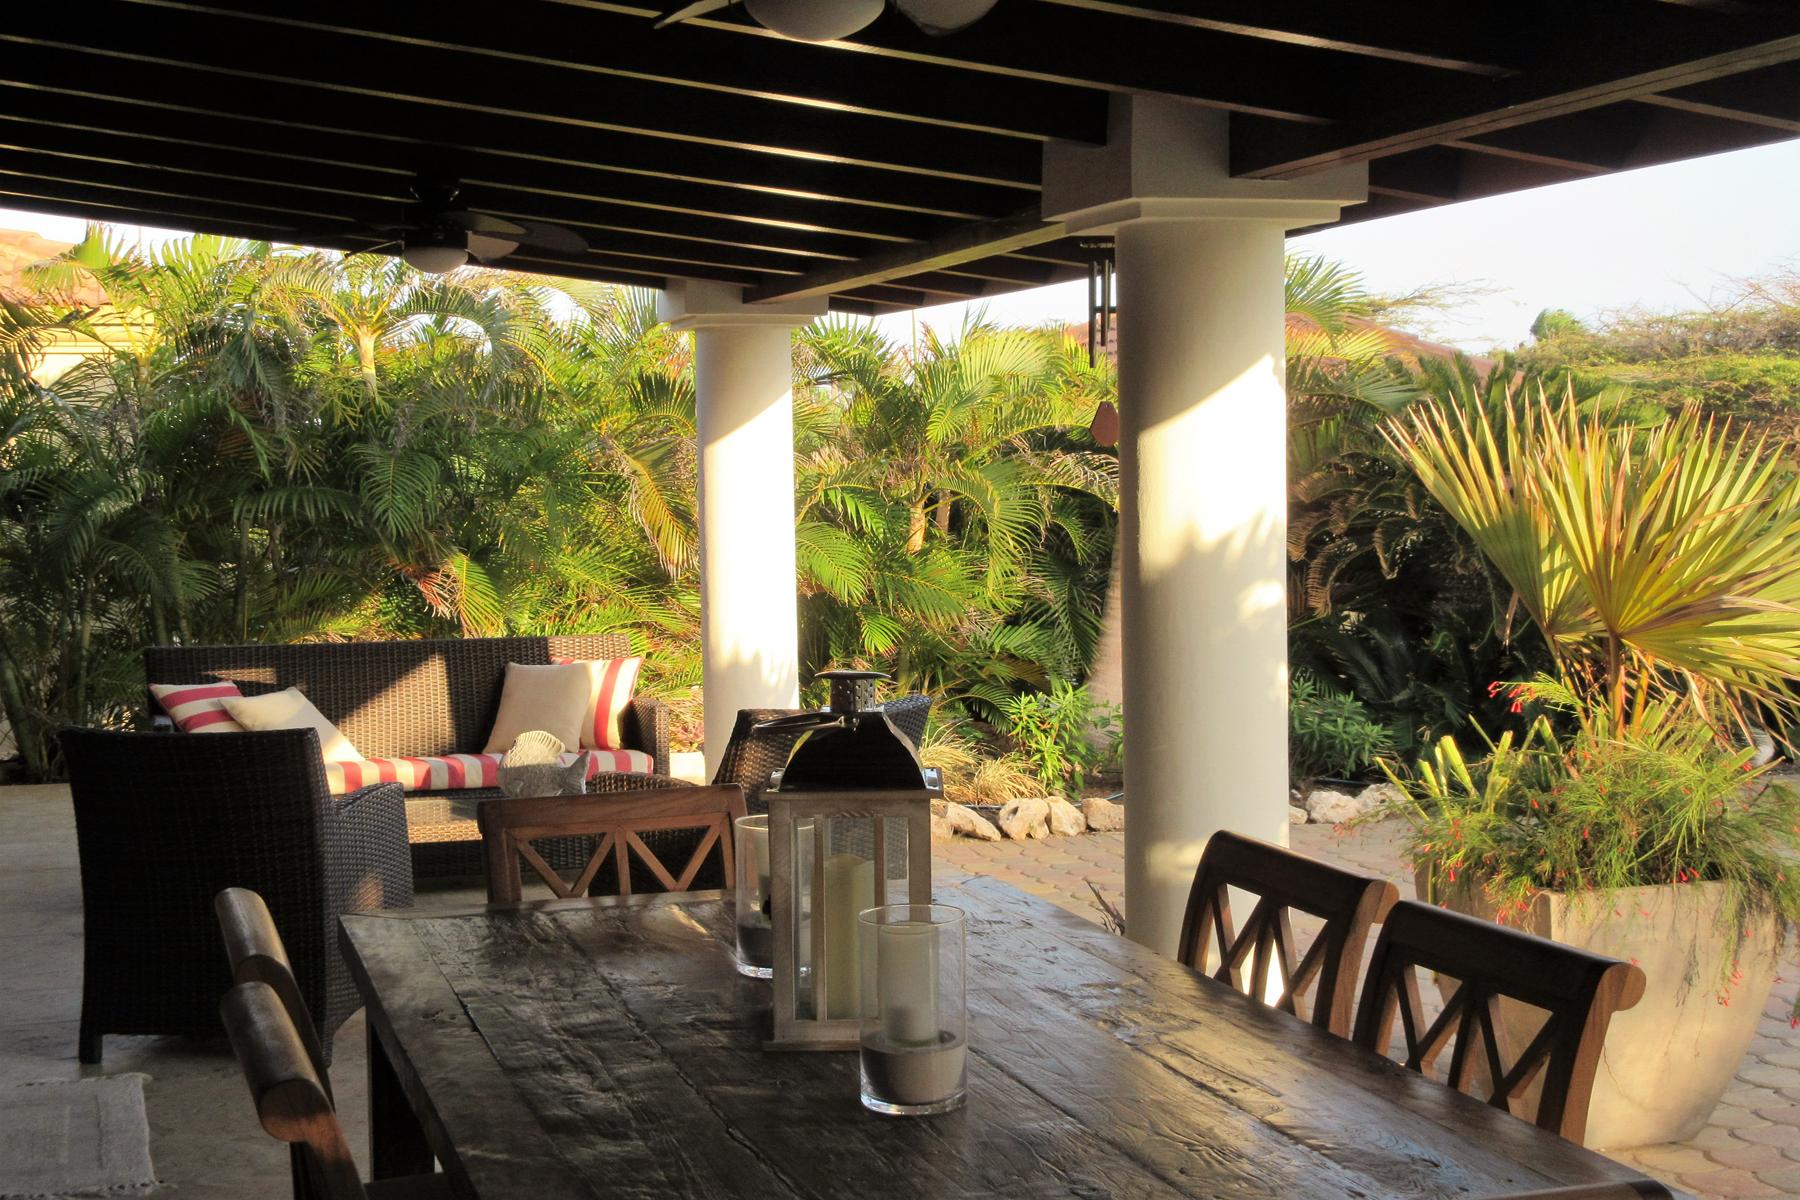 Additional photo for property listing at Spectacular Casita Villa Caya di Campeonnan 19 Las Campeonas Malmok, Aruba 00000 Aruba